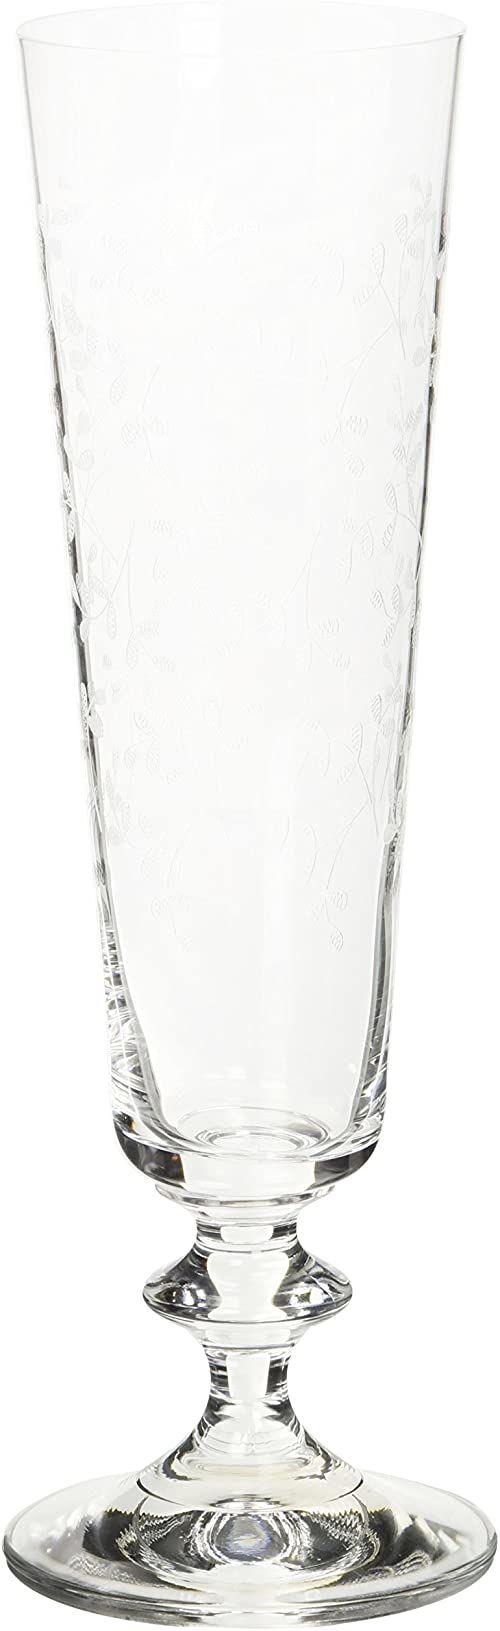 "Bohemia Cristal 093 006 045 kieliszki do szampana ok. 205 ml ze szkła kryształowego zestaw 6 sztuk ""Provence"""